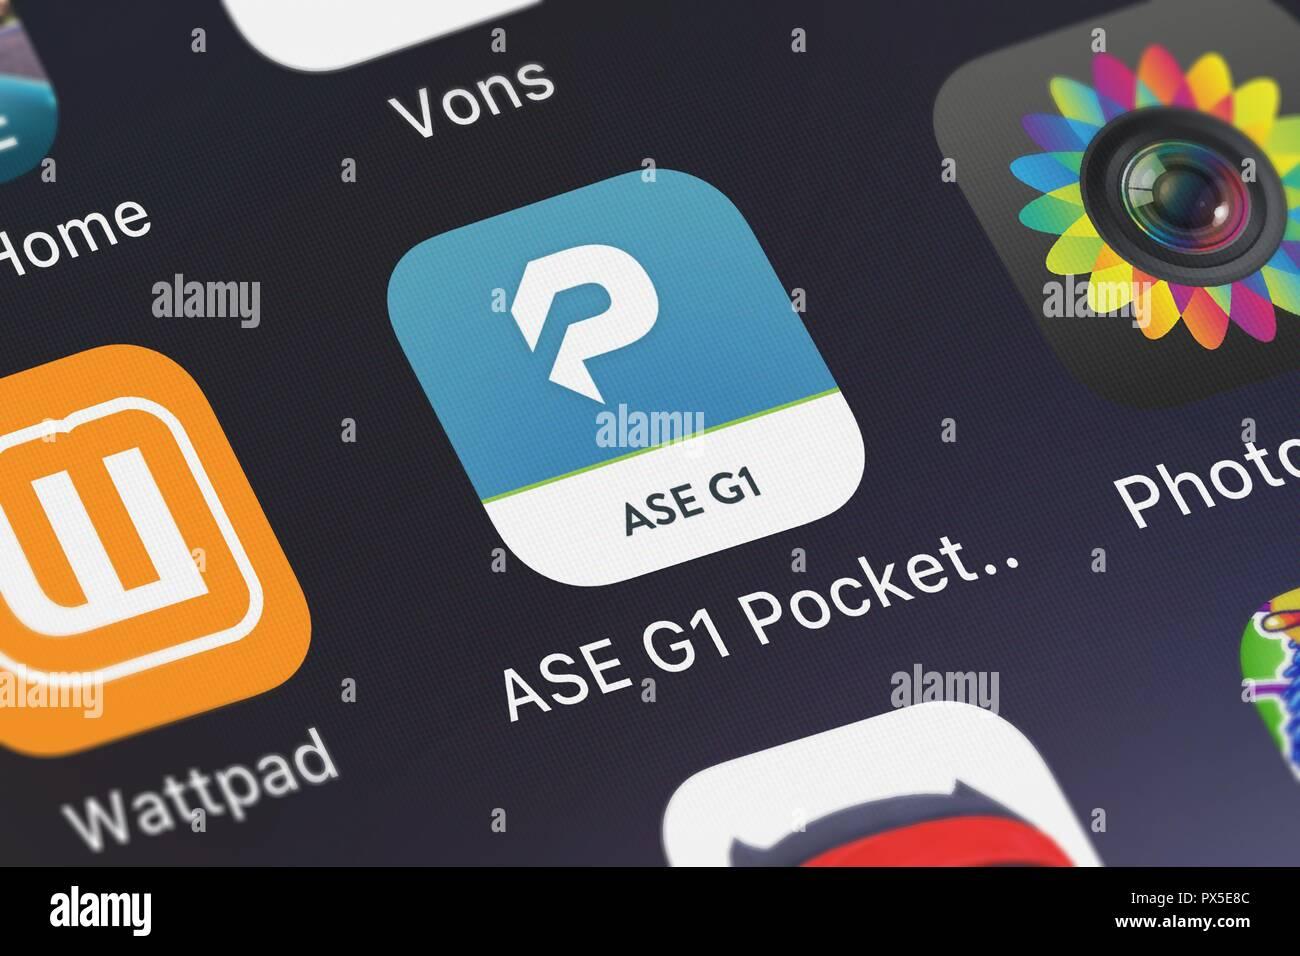 London, United Kingdom - October 19, 2018: Screenshot of the mobile app ASE G1 Pocket Prep from Pocket Prep, Inc.. - Stock Image